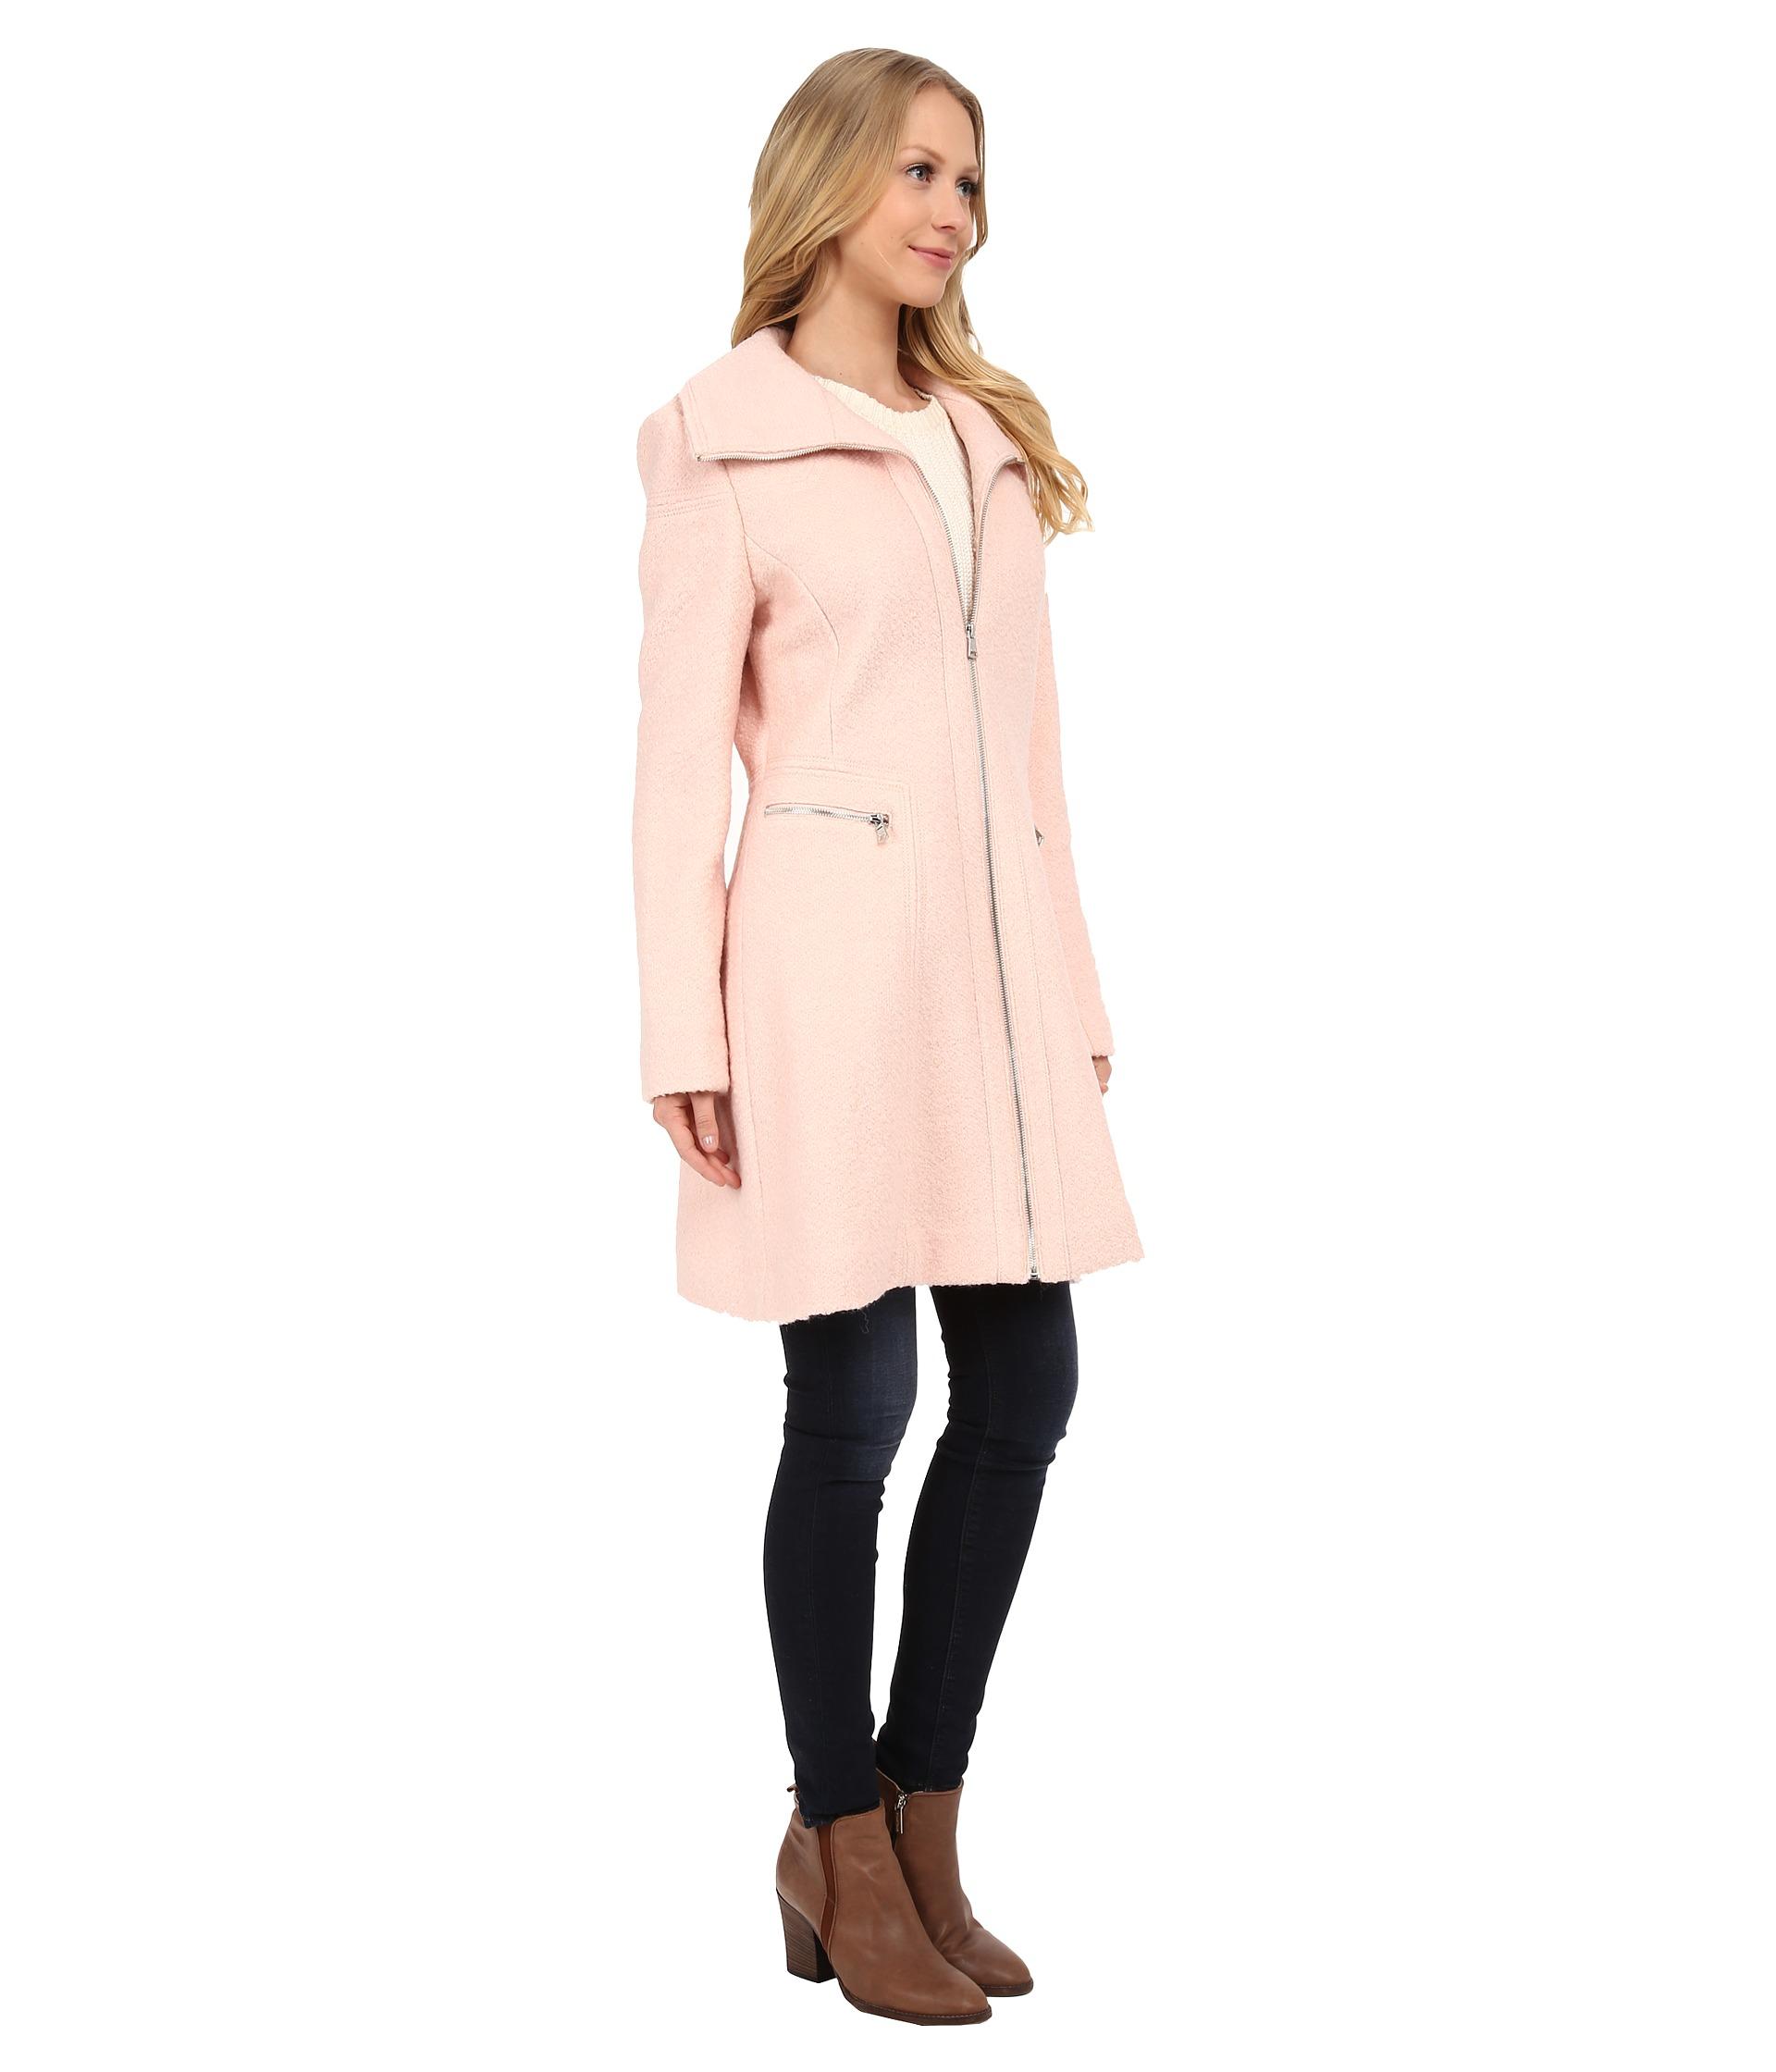 Jessica Simpson Pink Pea Coat Tradingbasis